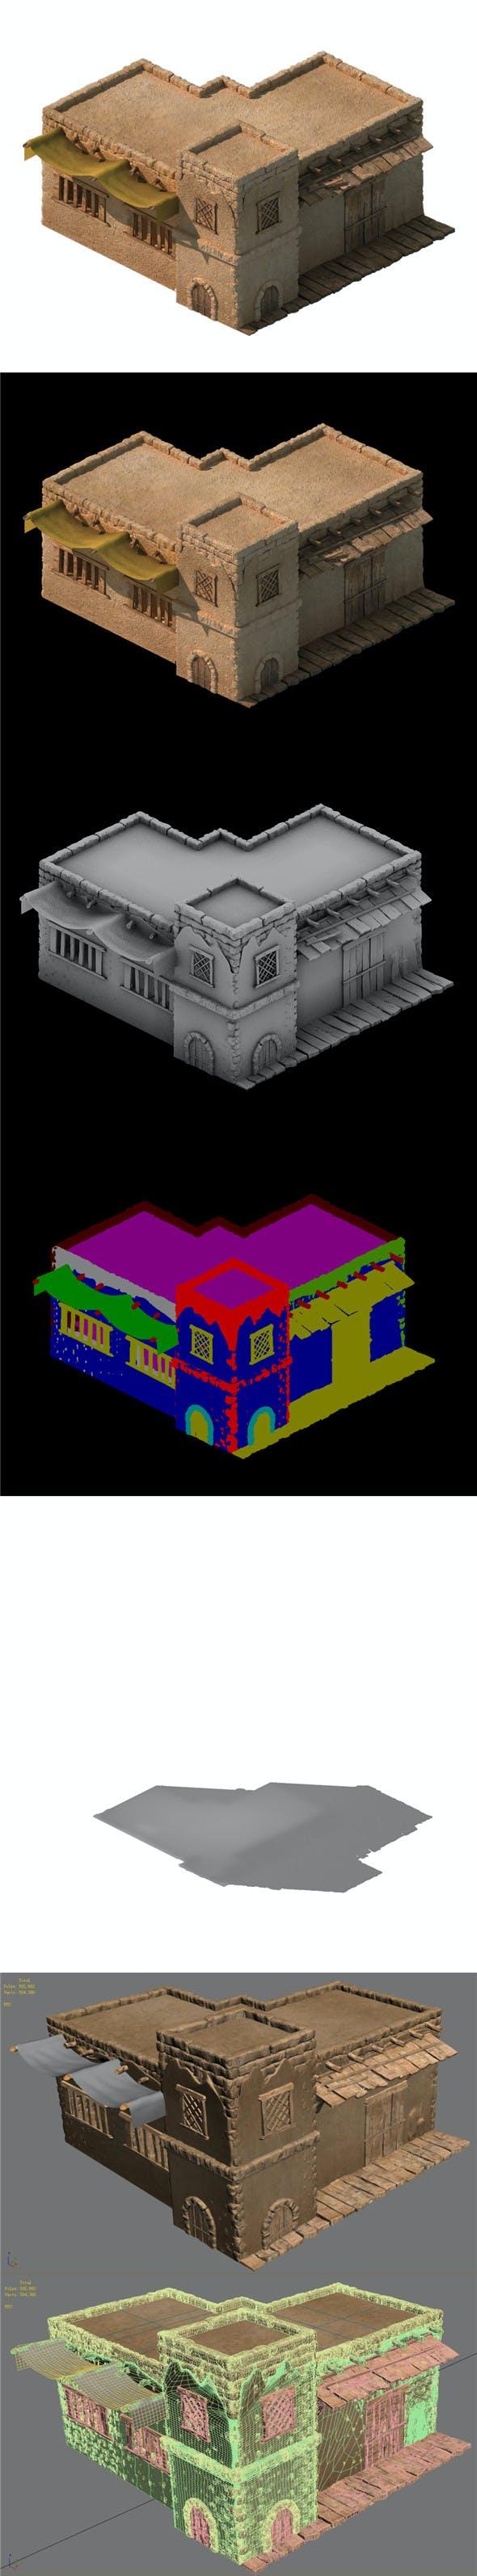 Desert Ancient Battlefield - House 04 - 3DOcean Item for Sale